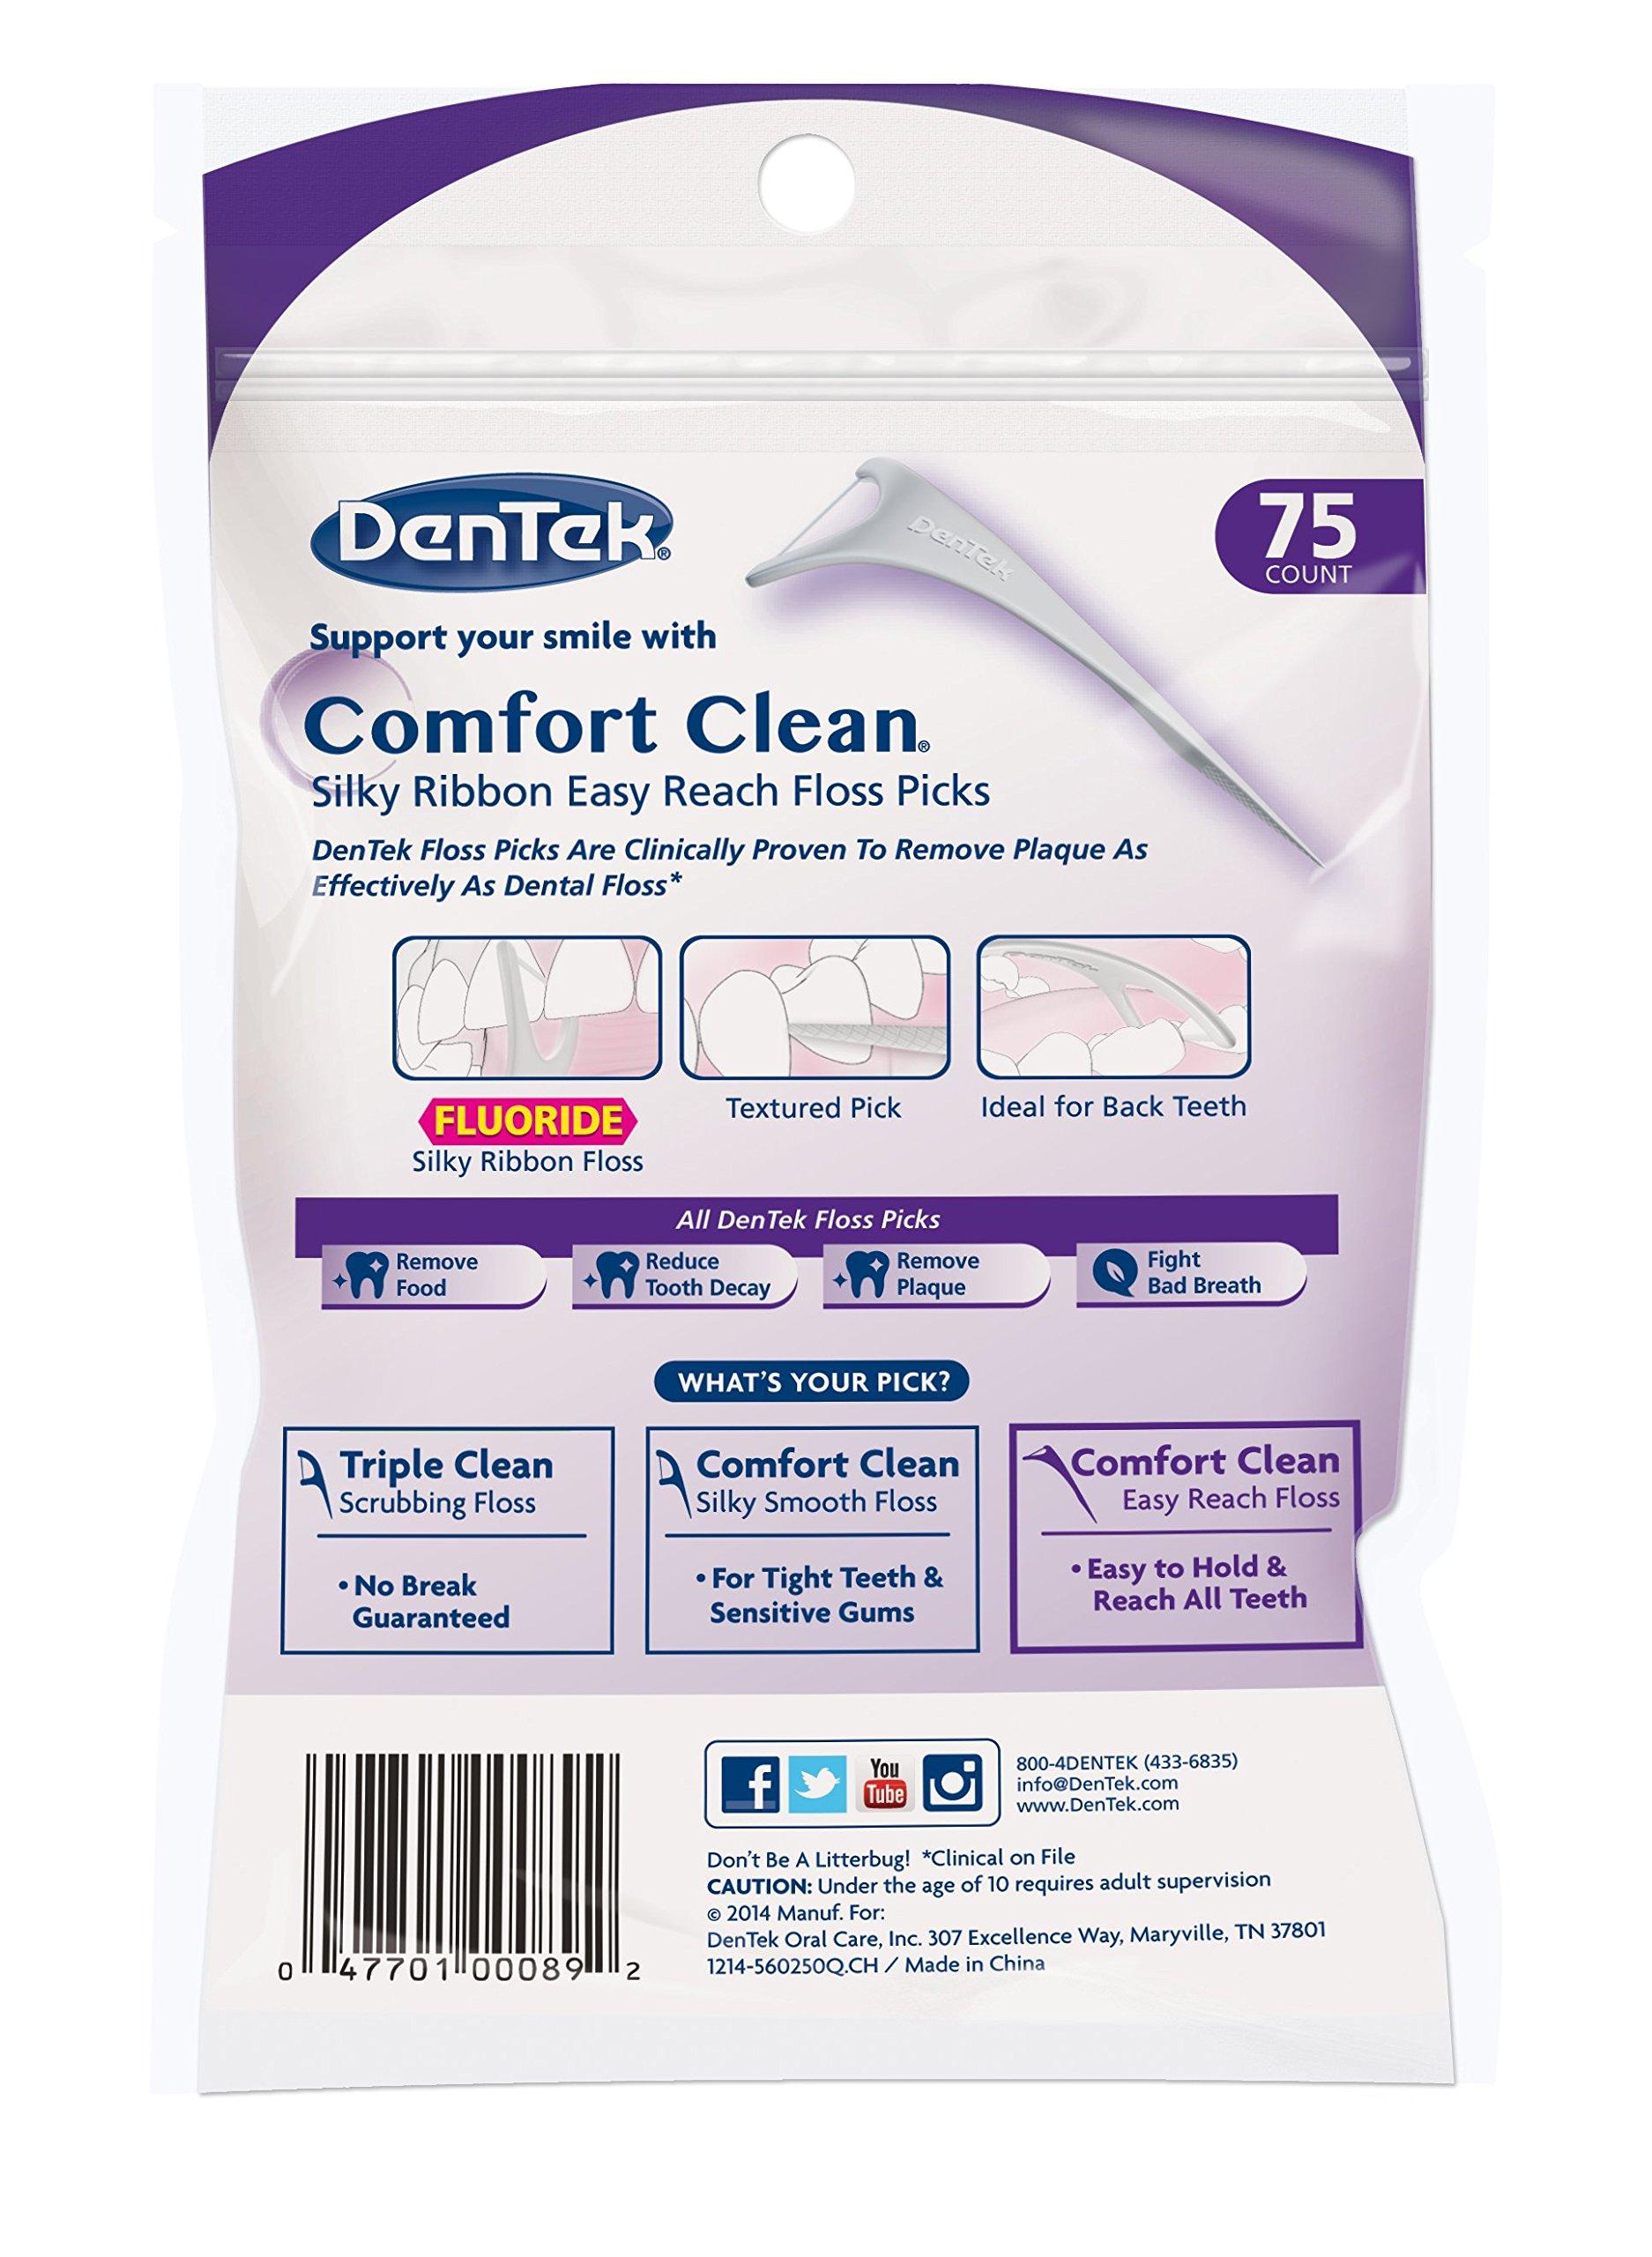 Dentek Comfort Clean Floss Picks | Silky Ribbon Floss to Remove Food & Plaque | 75 Picks | Pack of 6 by DenTek (Image #2)